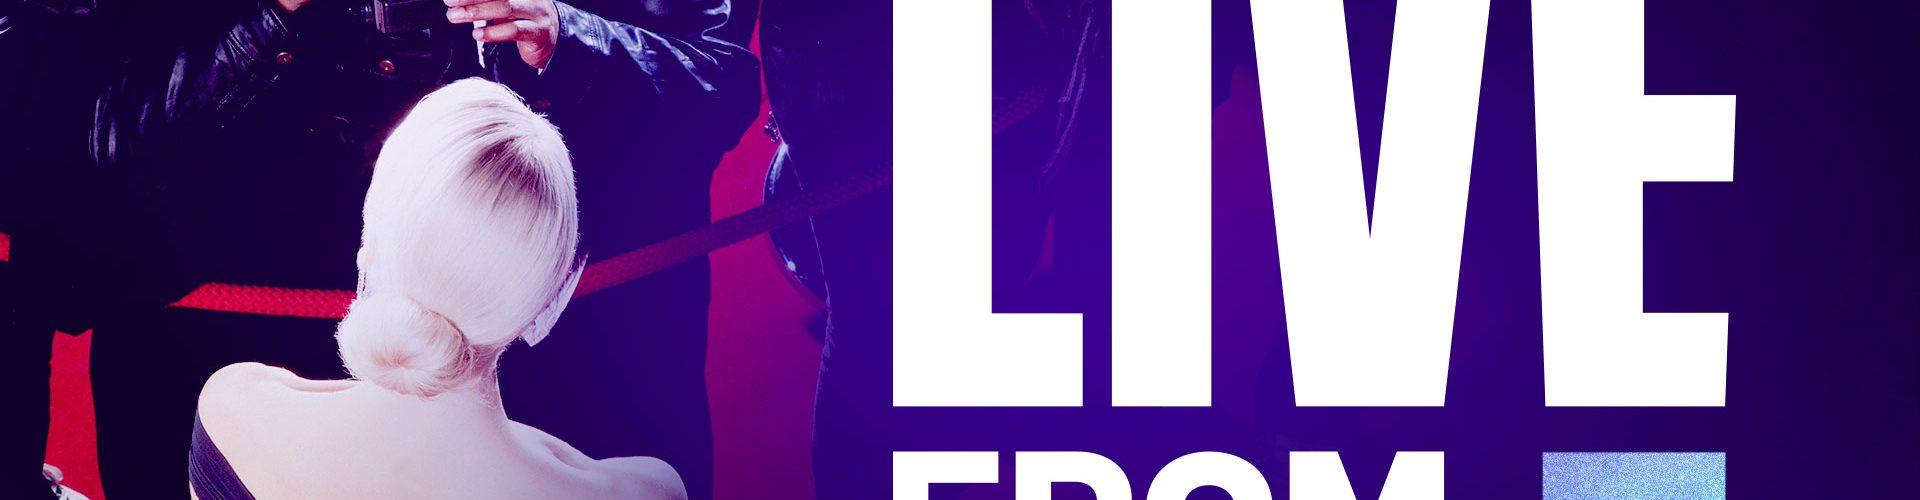 E! LIVE FROM THE RED CARPET  SA DODELE ZLATNIH GLOBUSA  UŽIVO 28. FEBRUARA